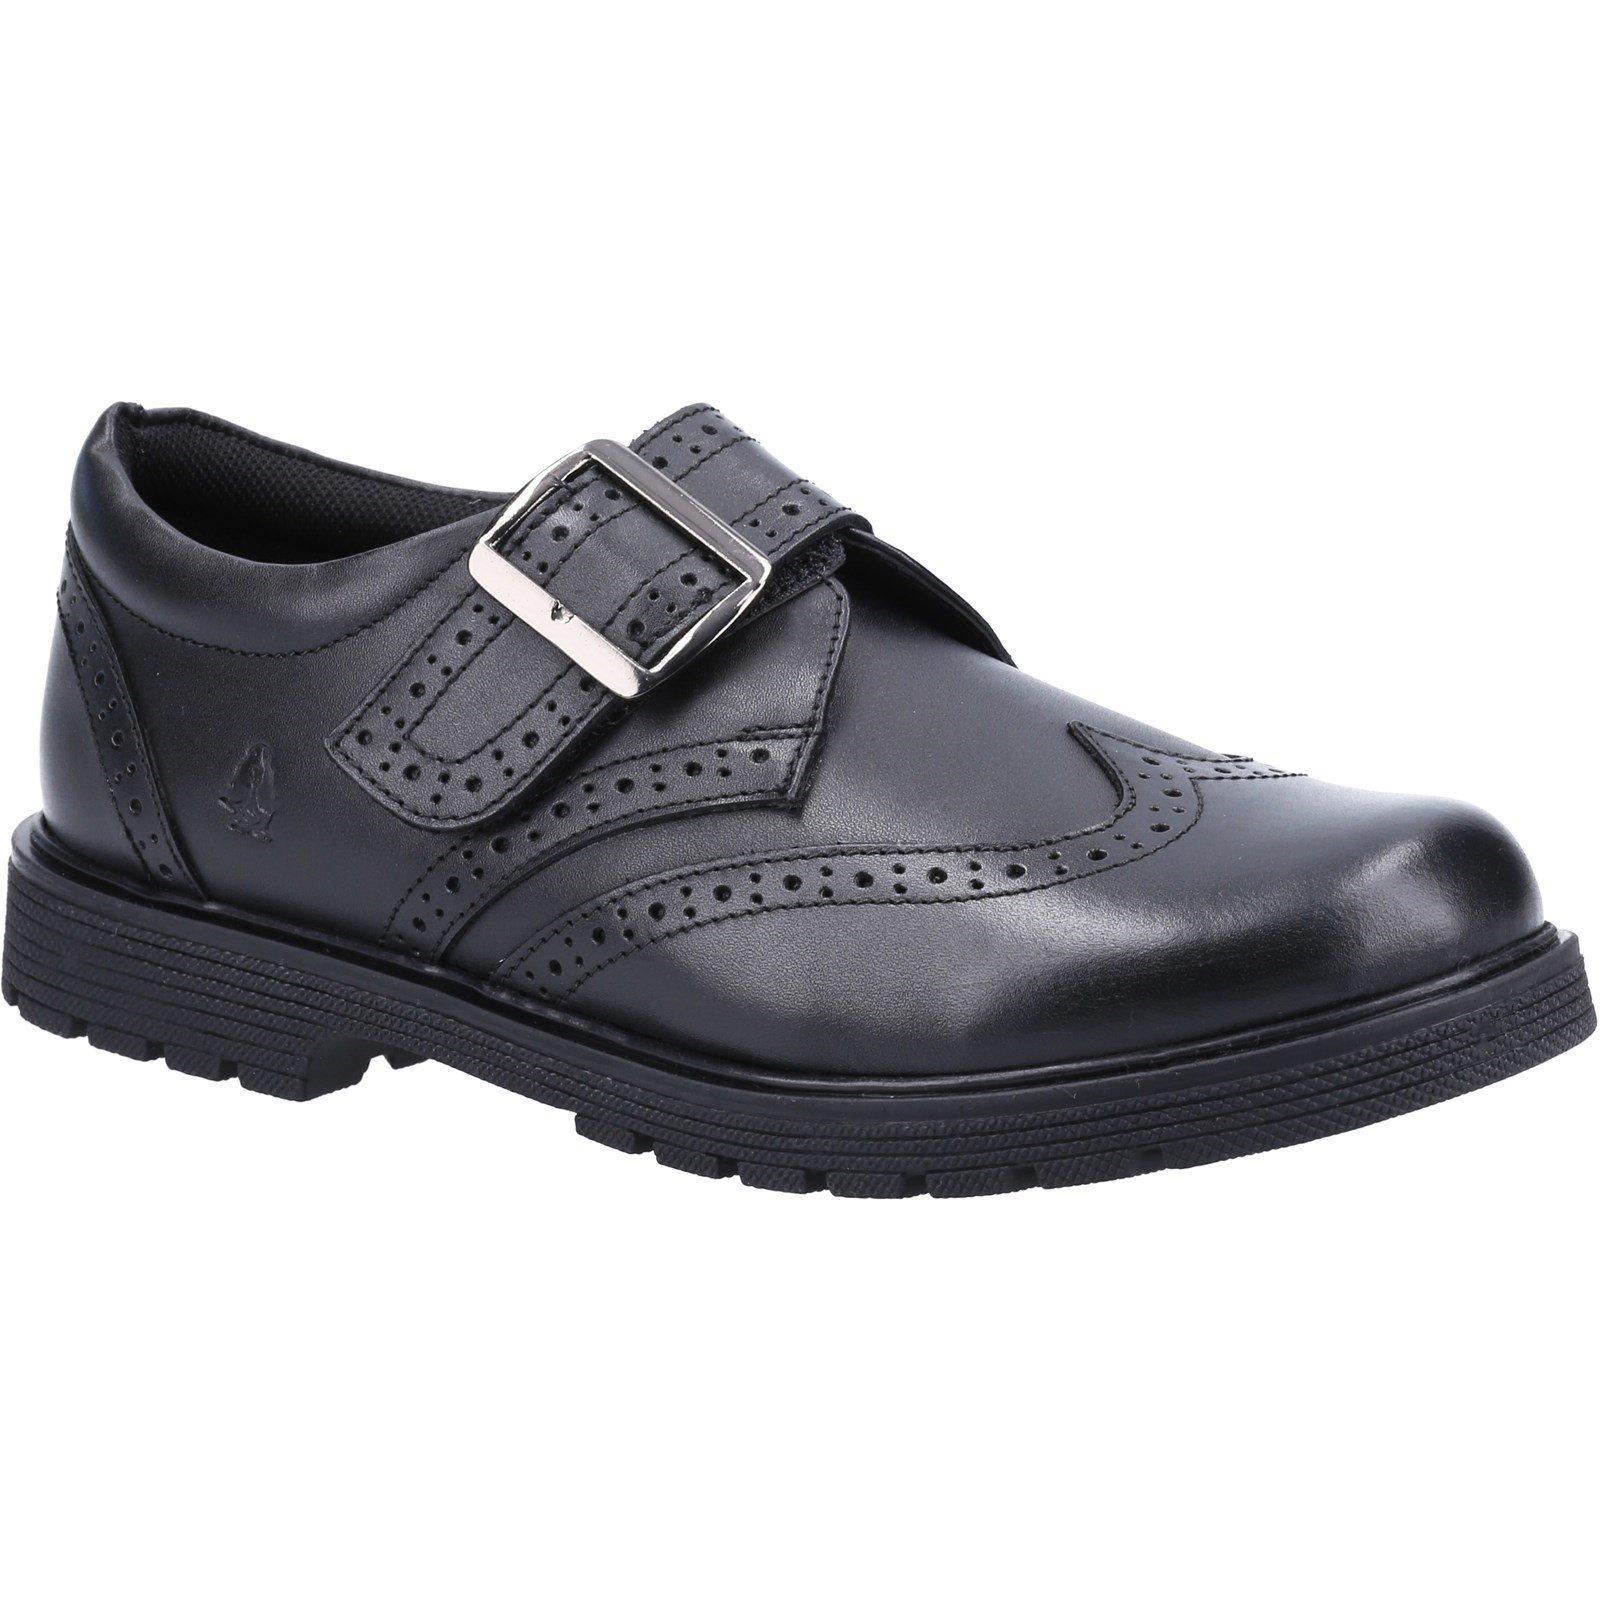 Hush Puppies Kid's Rhiannon Senior School Shoe Black 32626-55768 - Black 4